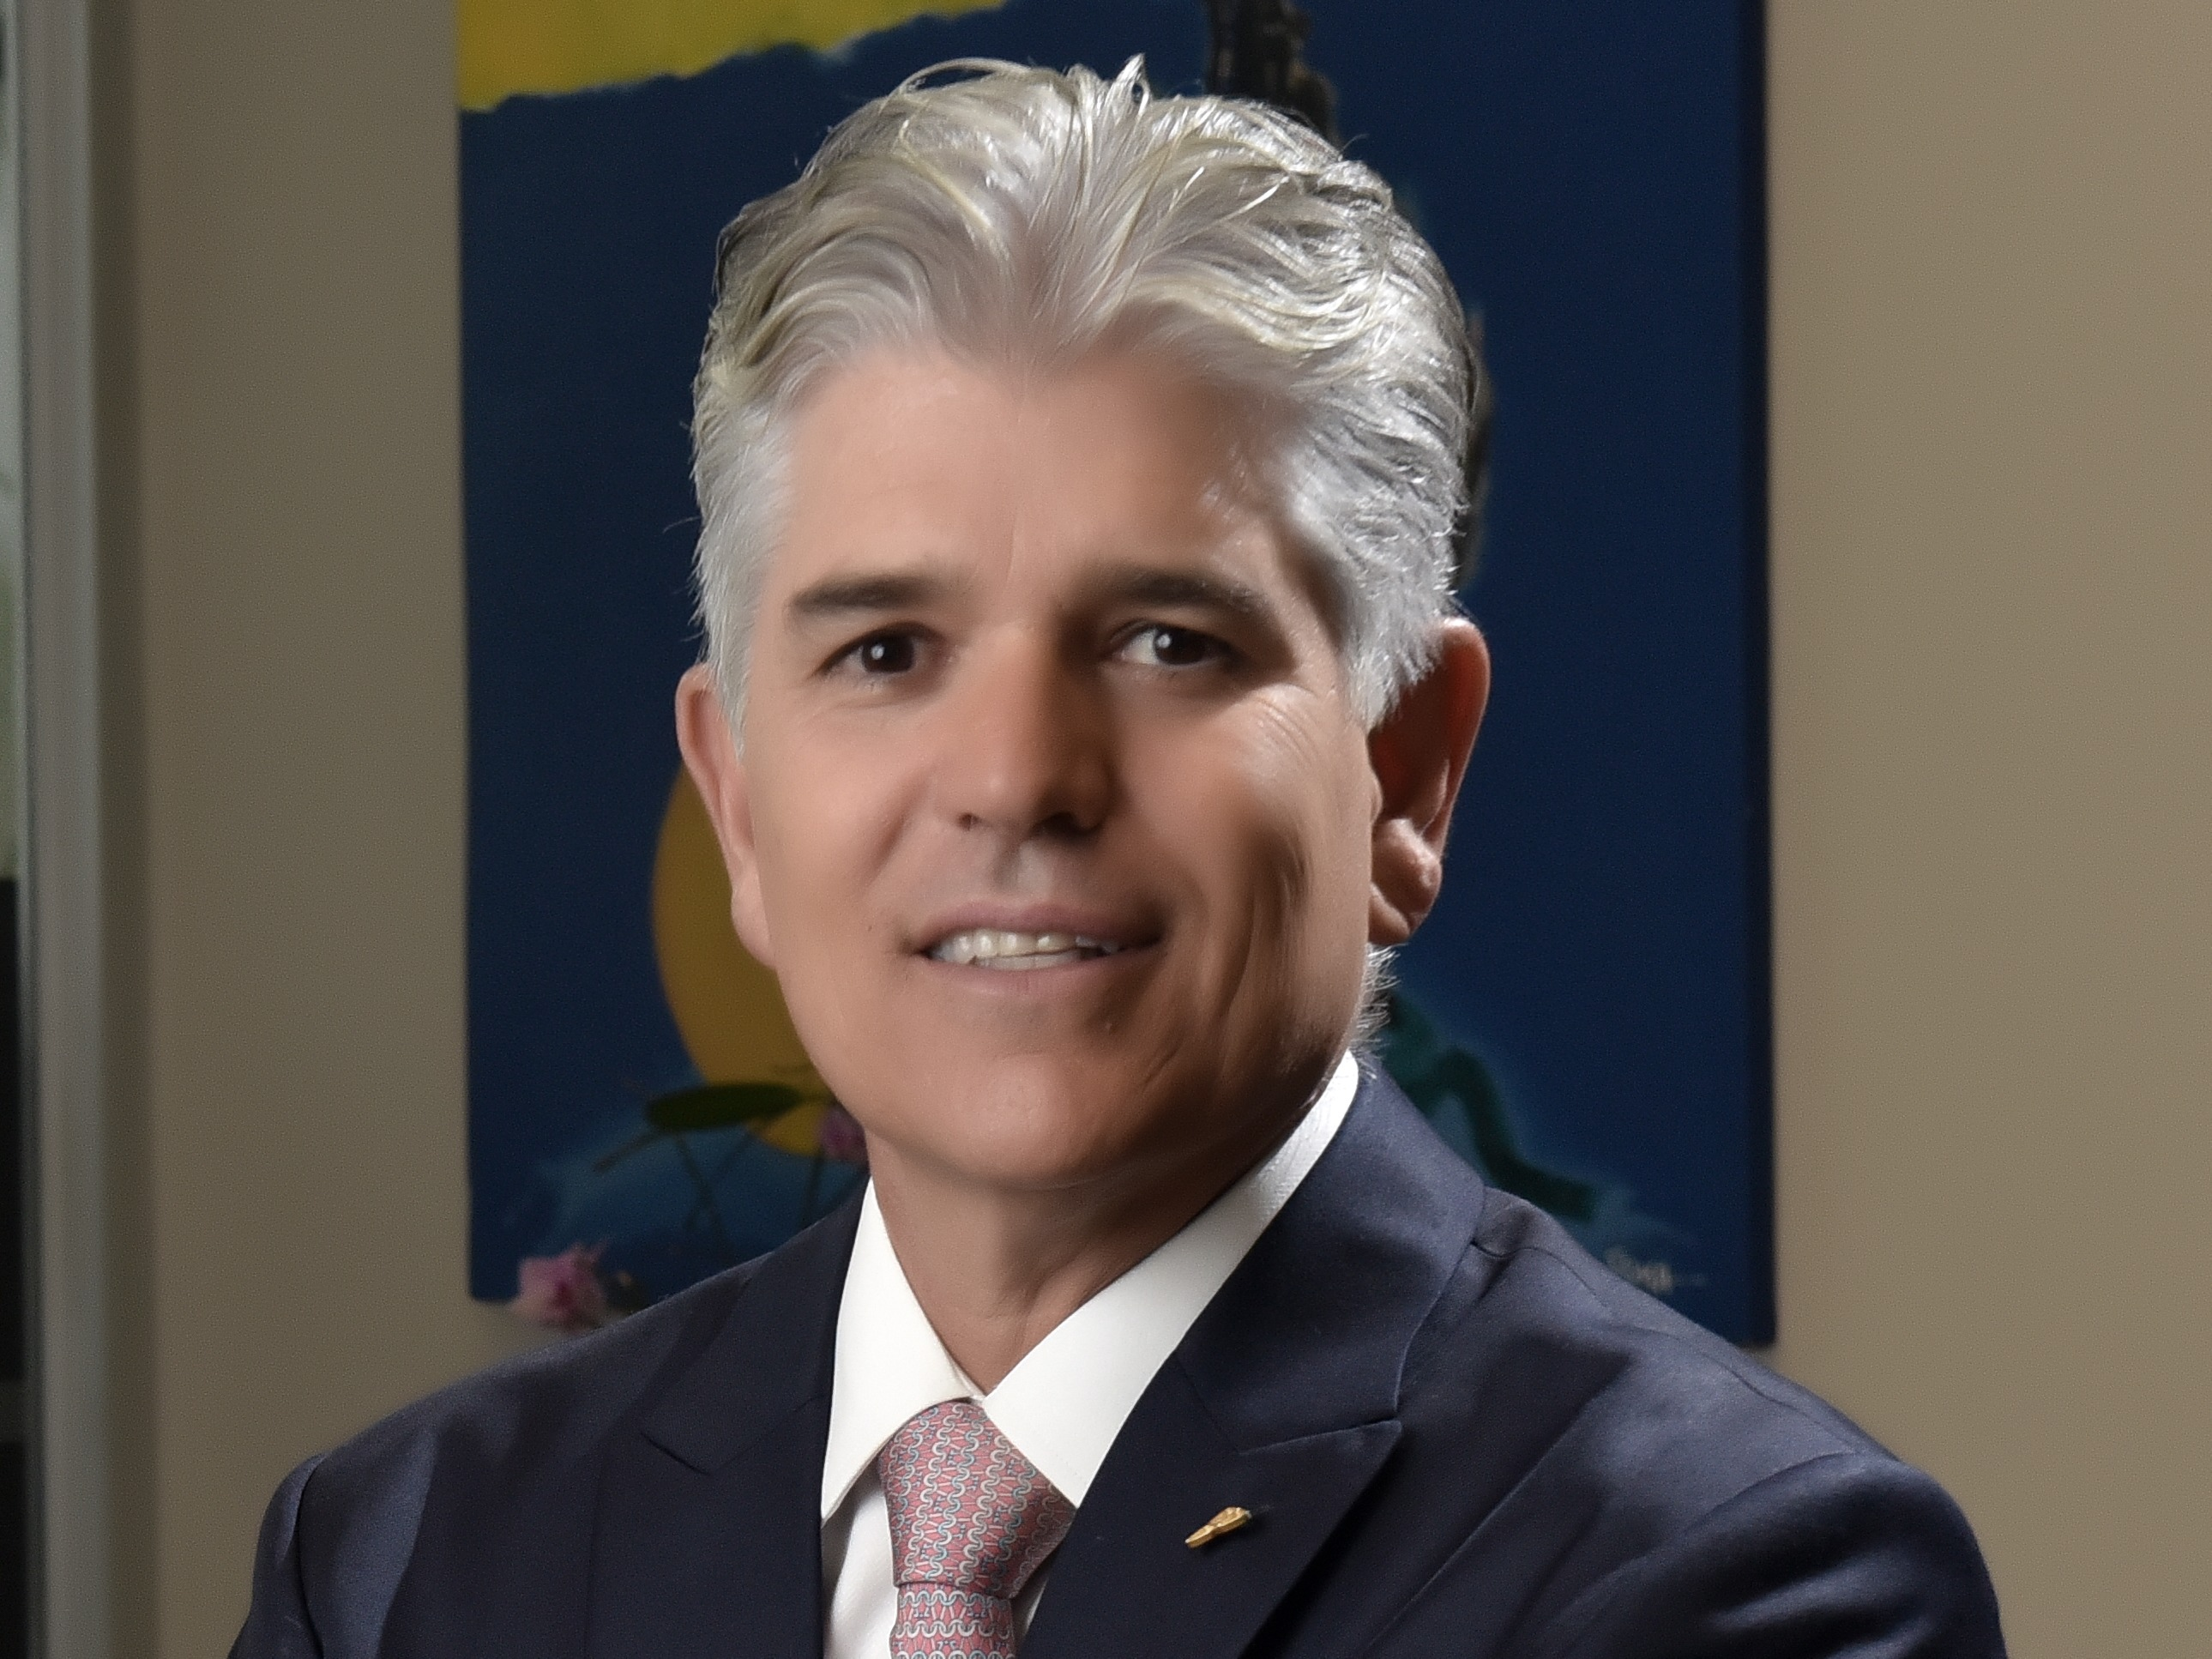 Colunista Luiz Alexandre Garcia